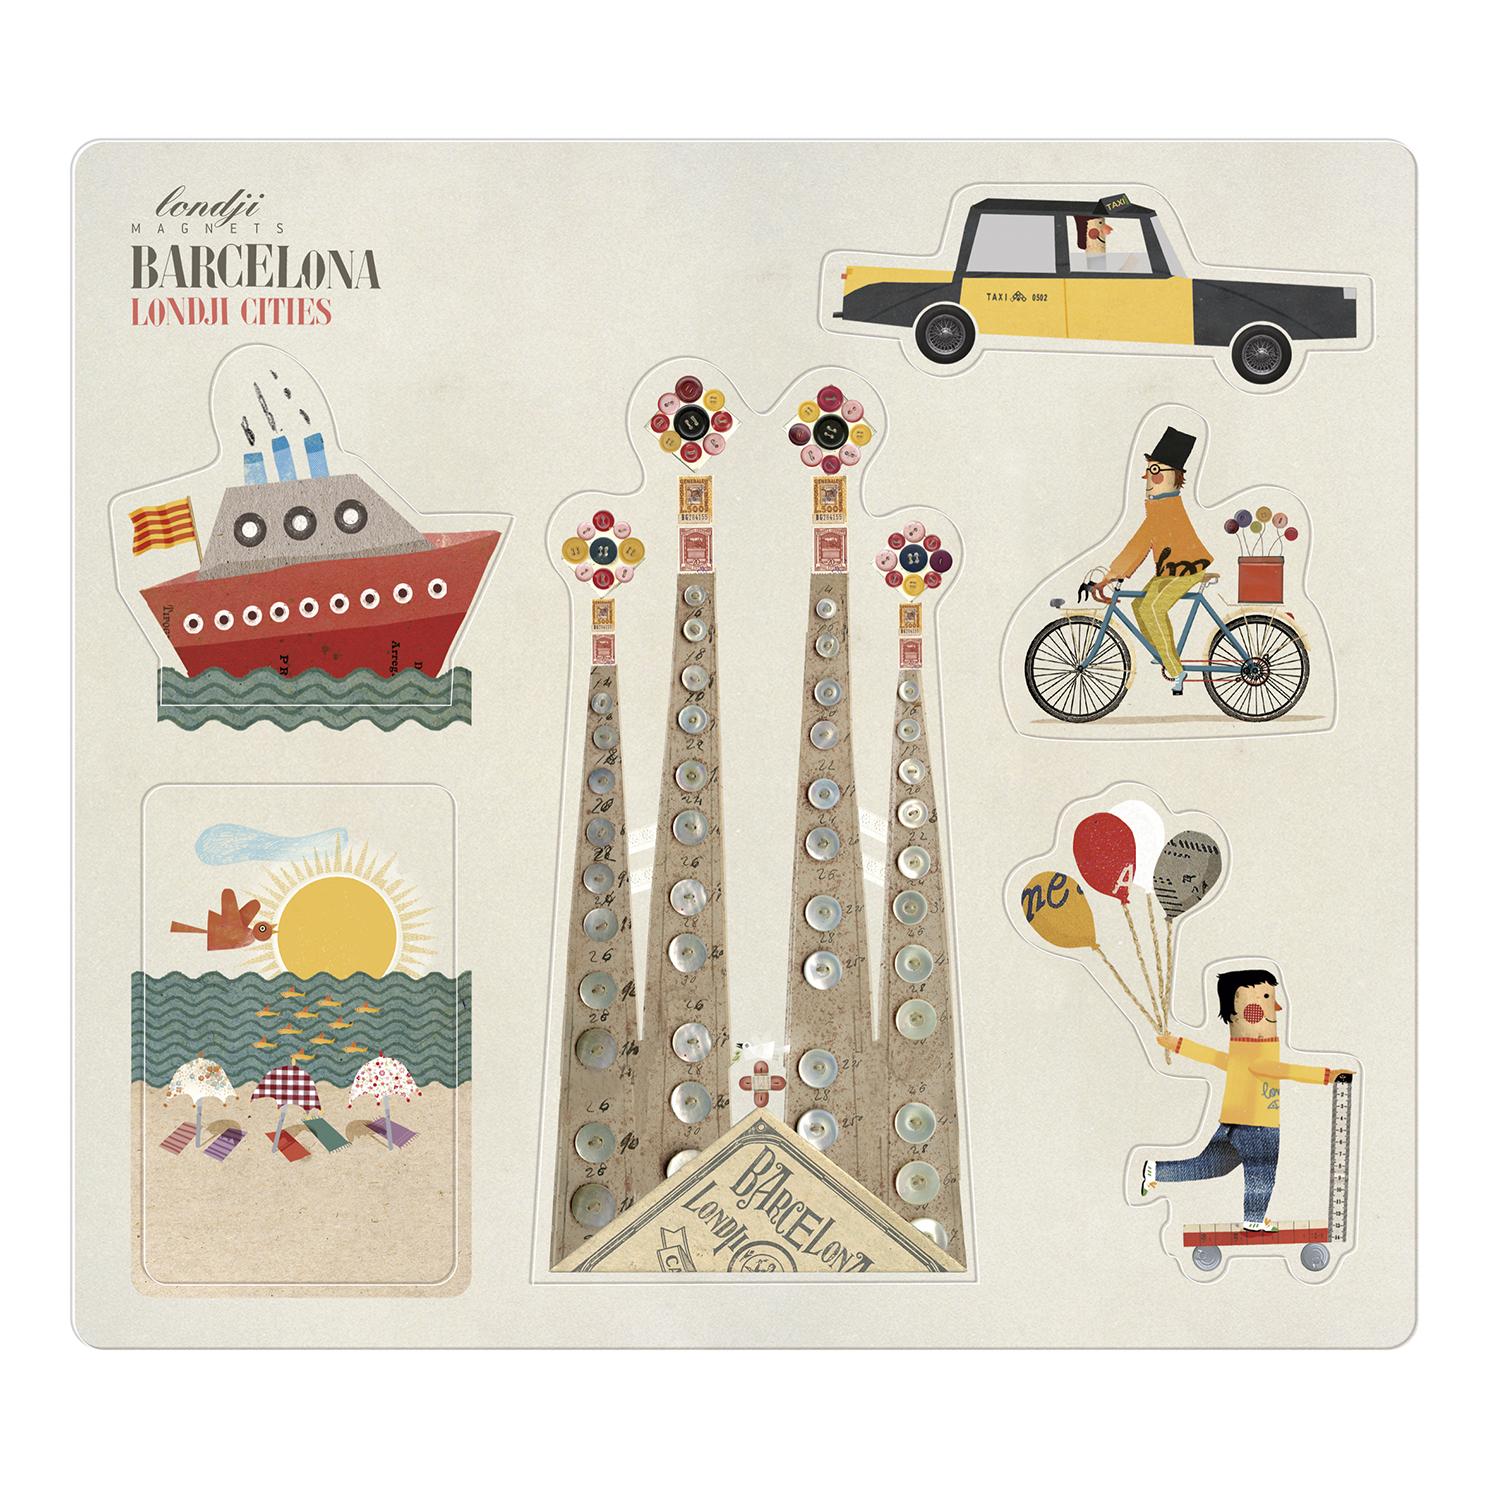 Londji – Barcelona Fridge Magnets on Card